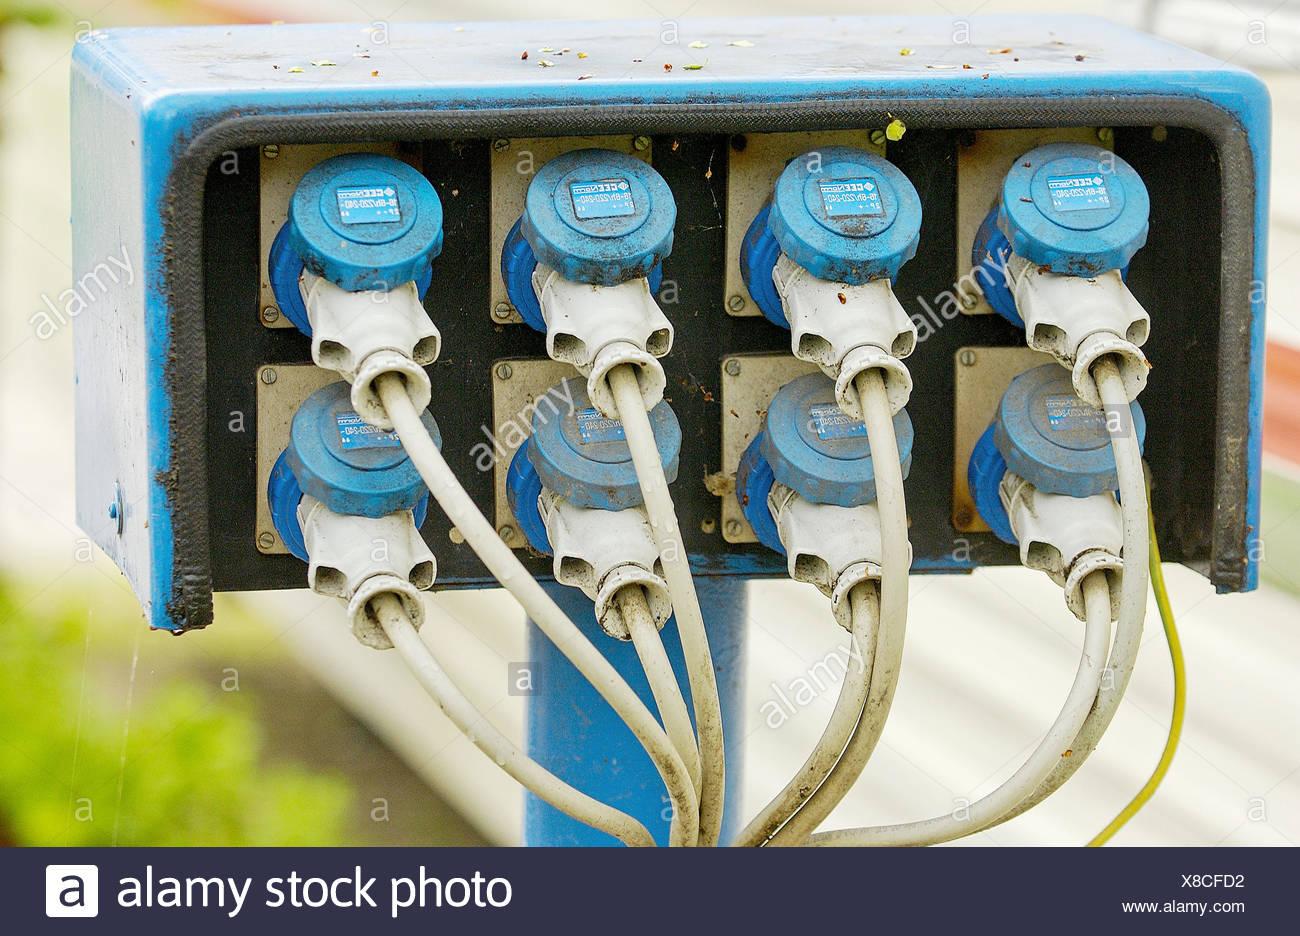 Plugs at camp site. Camping Fusina, Venezia. Veneto, Italy Stock Photo